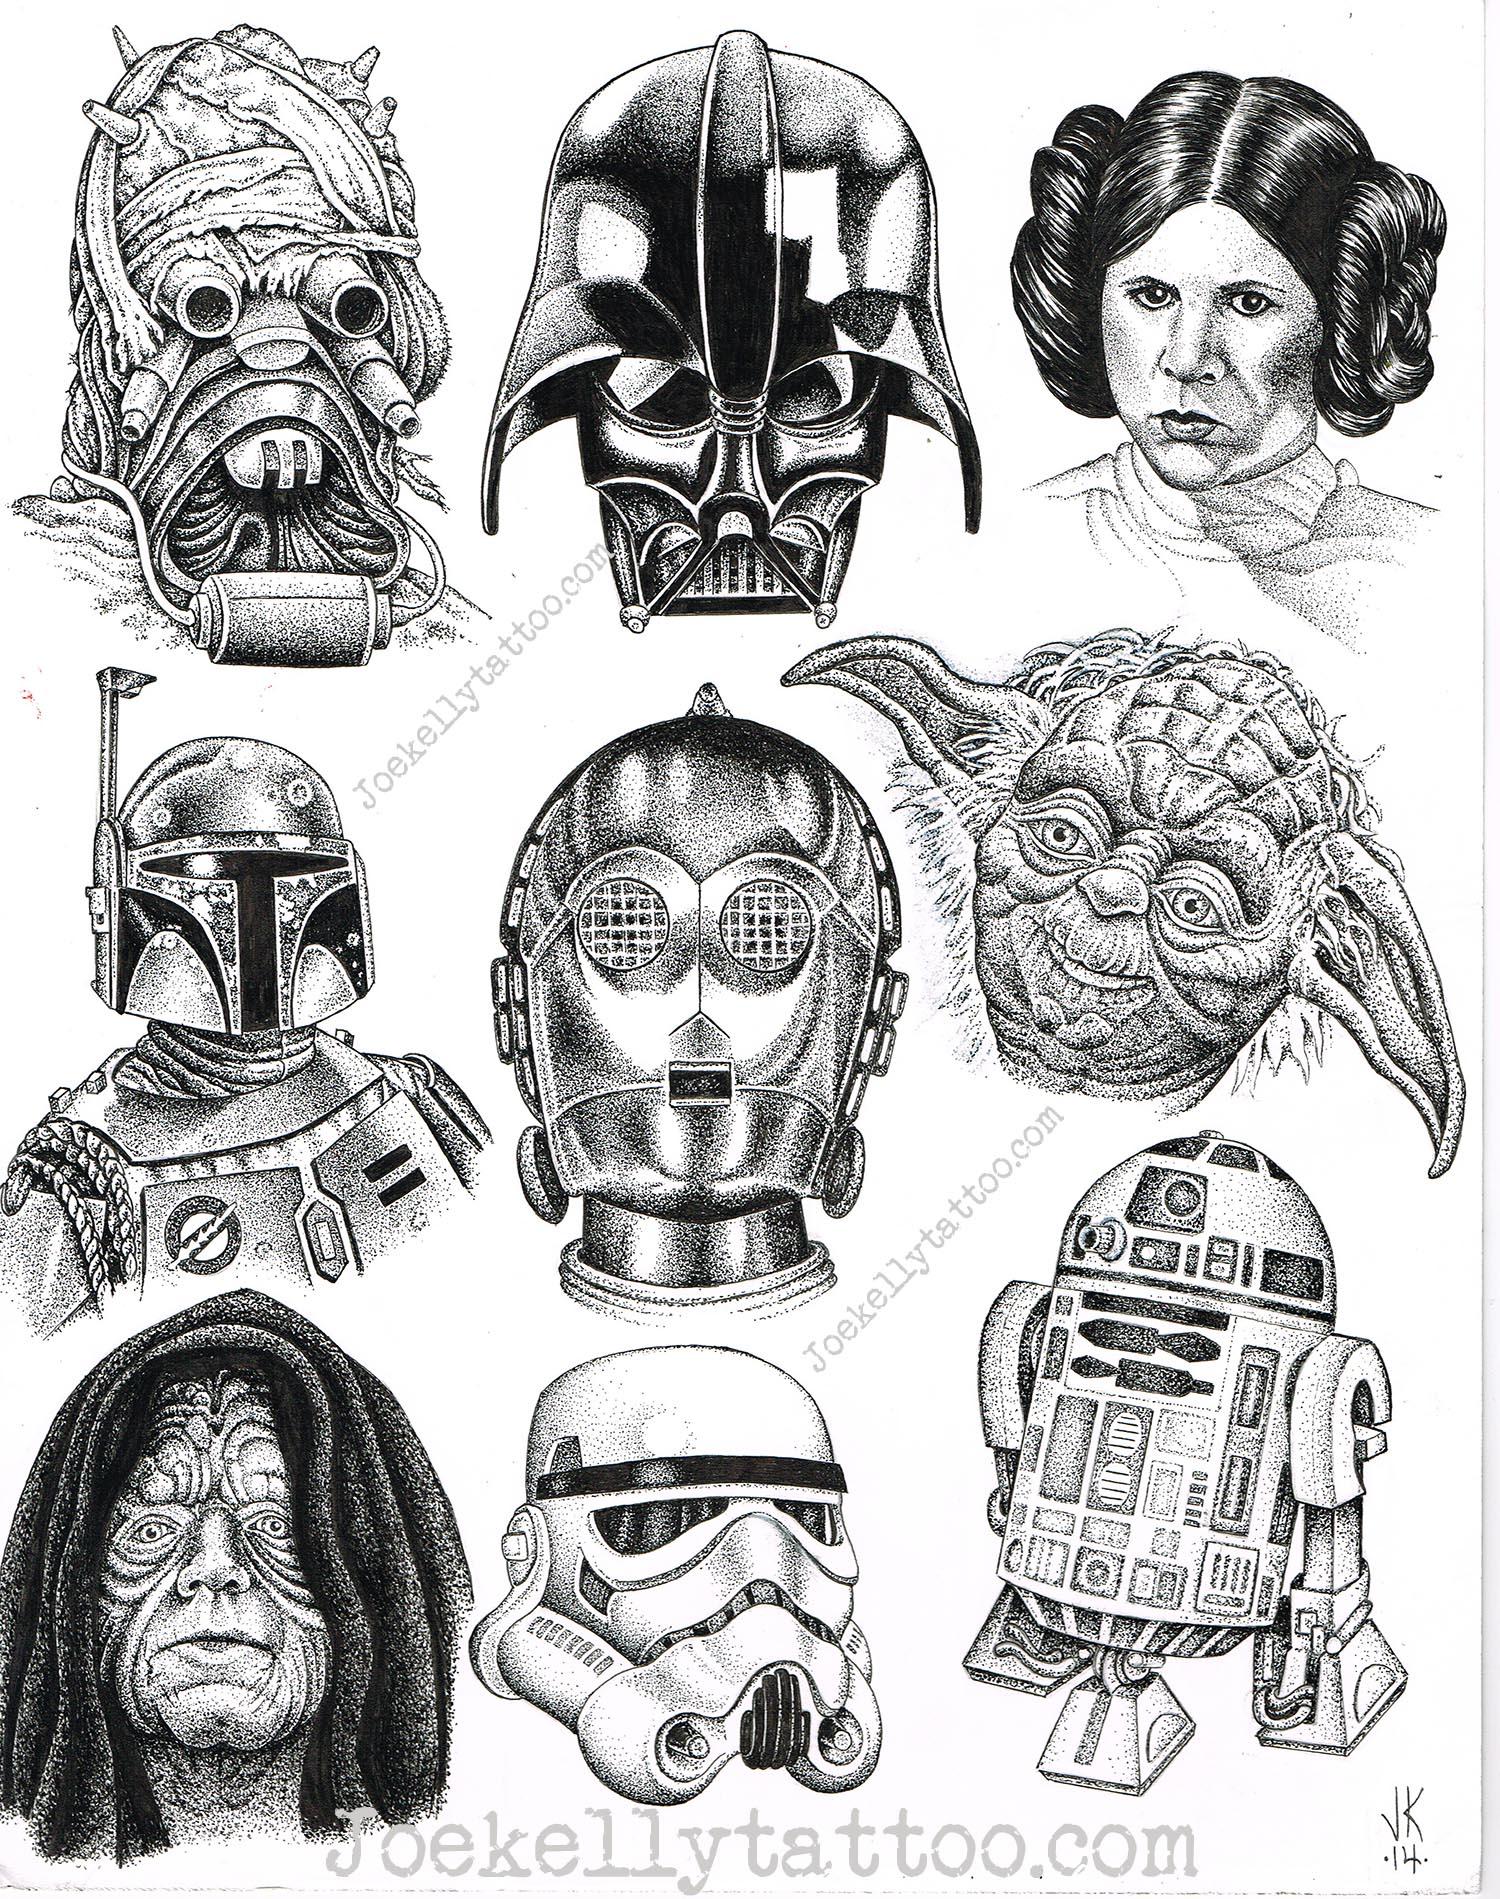 Joes Star Wars Flash Sheet Moth And Dagger Tattoo Studio